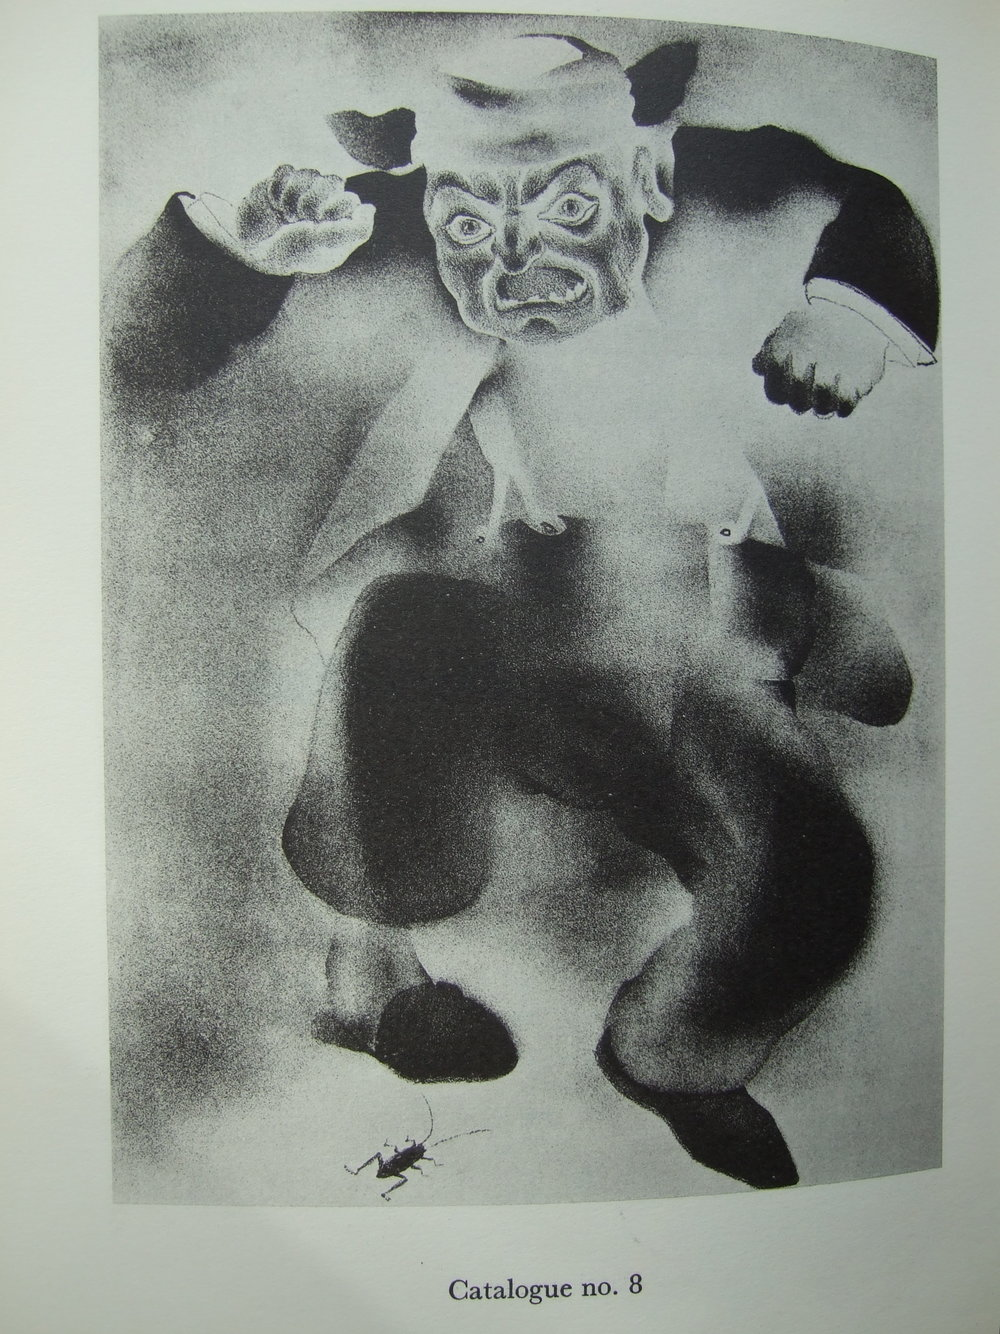 Dostoevsky, Les Freres Karamazov (The Brothers Karamazov). Paris, 1929.